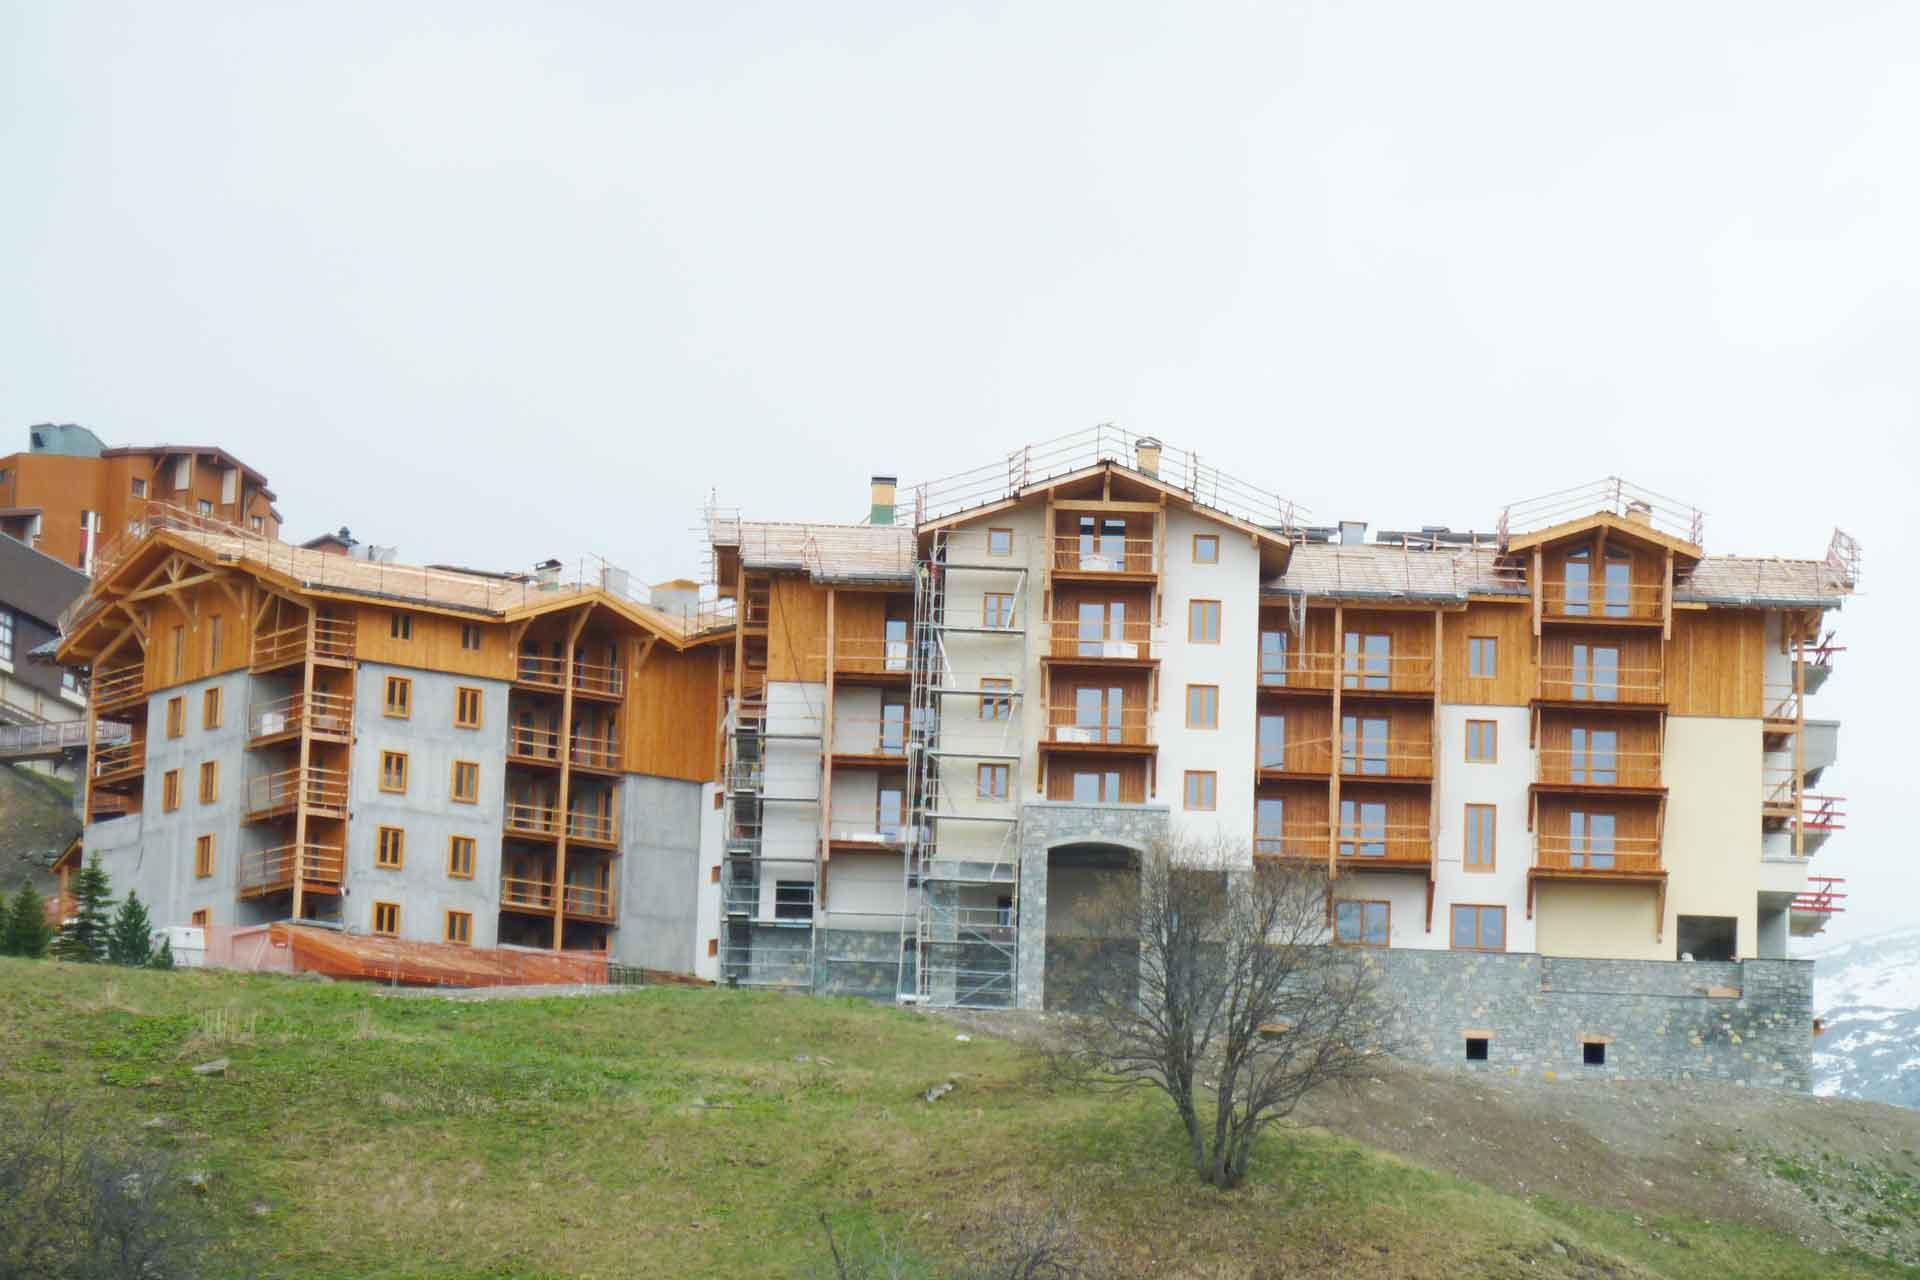 140-hotel-chaletmontvallon-img-(1)